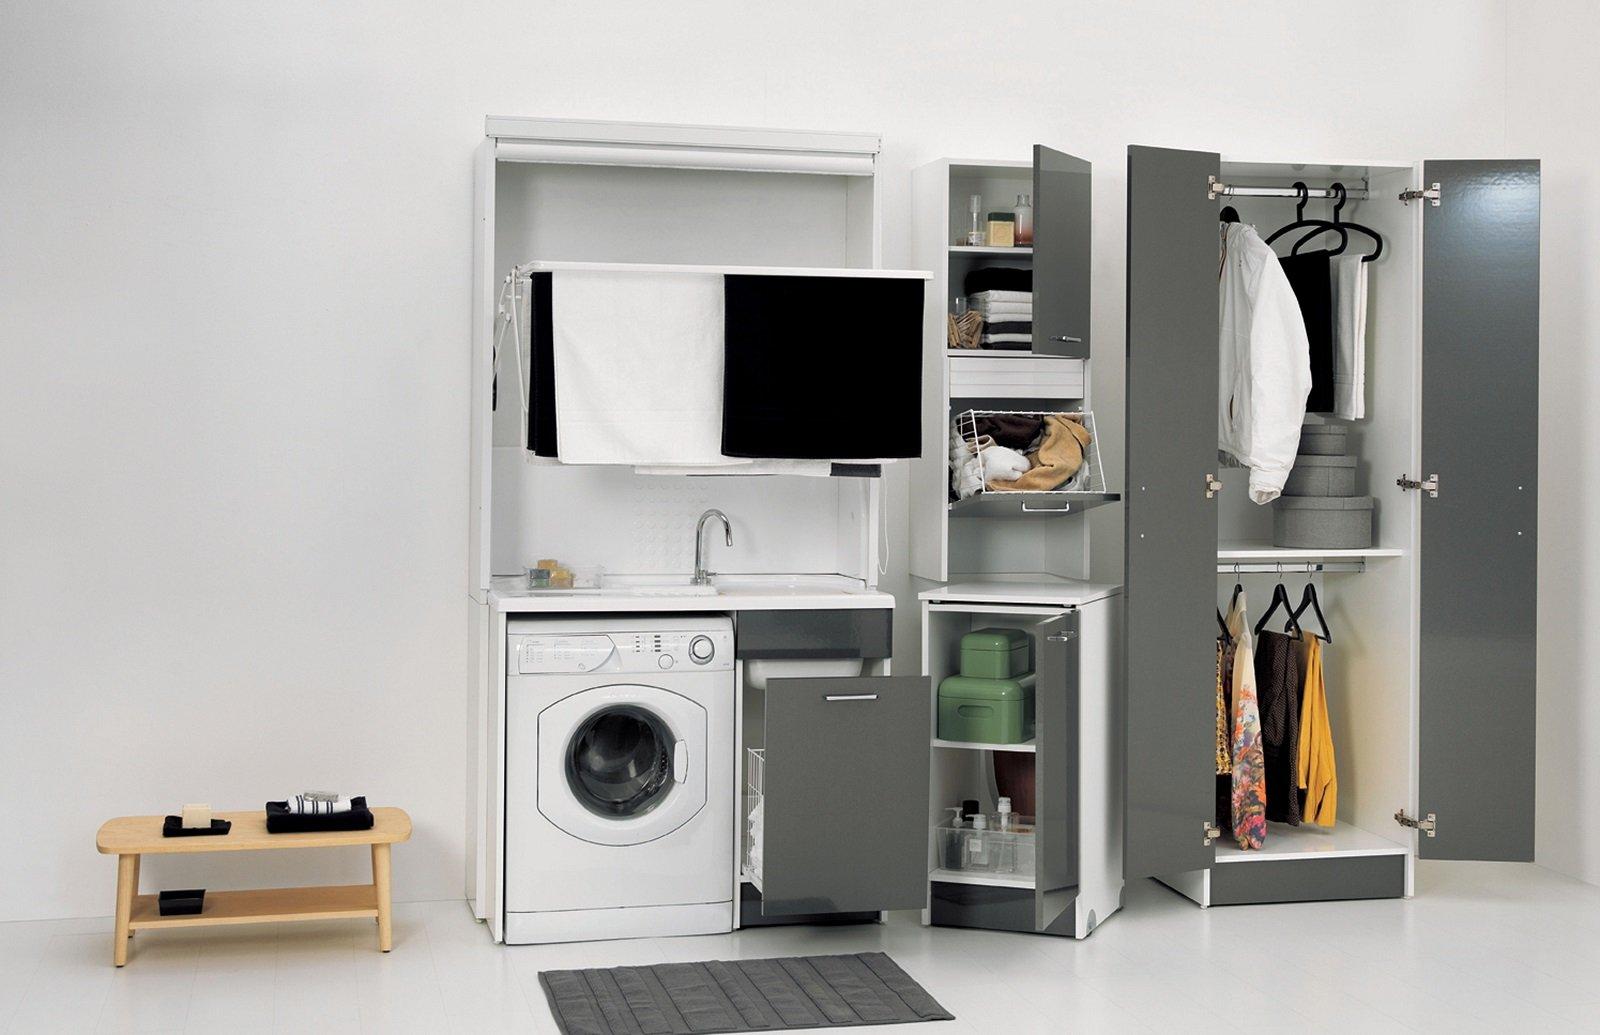 Mobili Per Lavanderia Di Casa.Lavanderia In Bagno Cose Di Casa